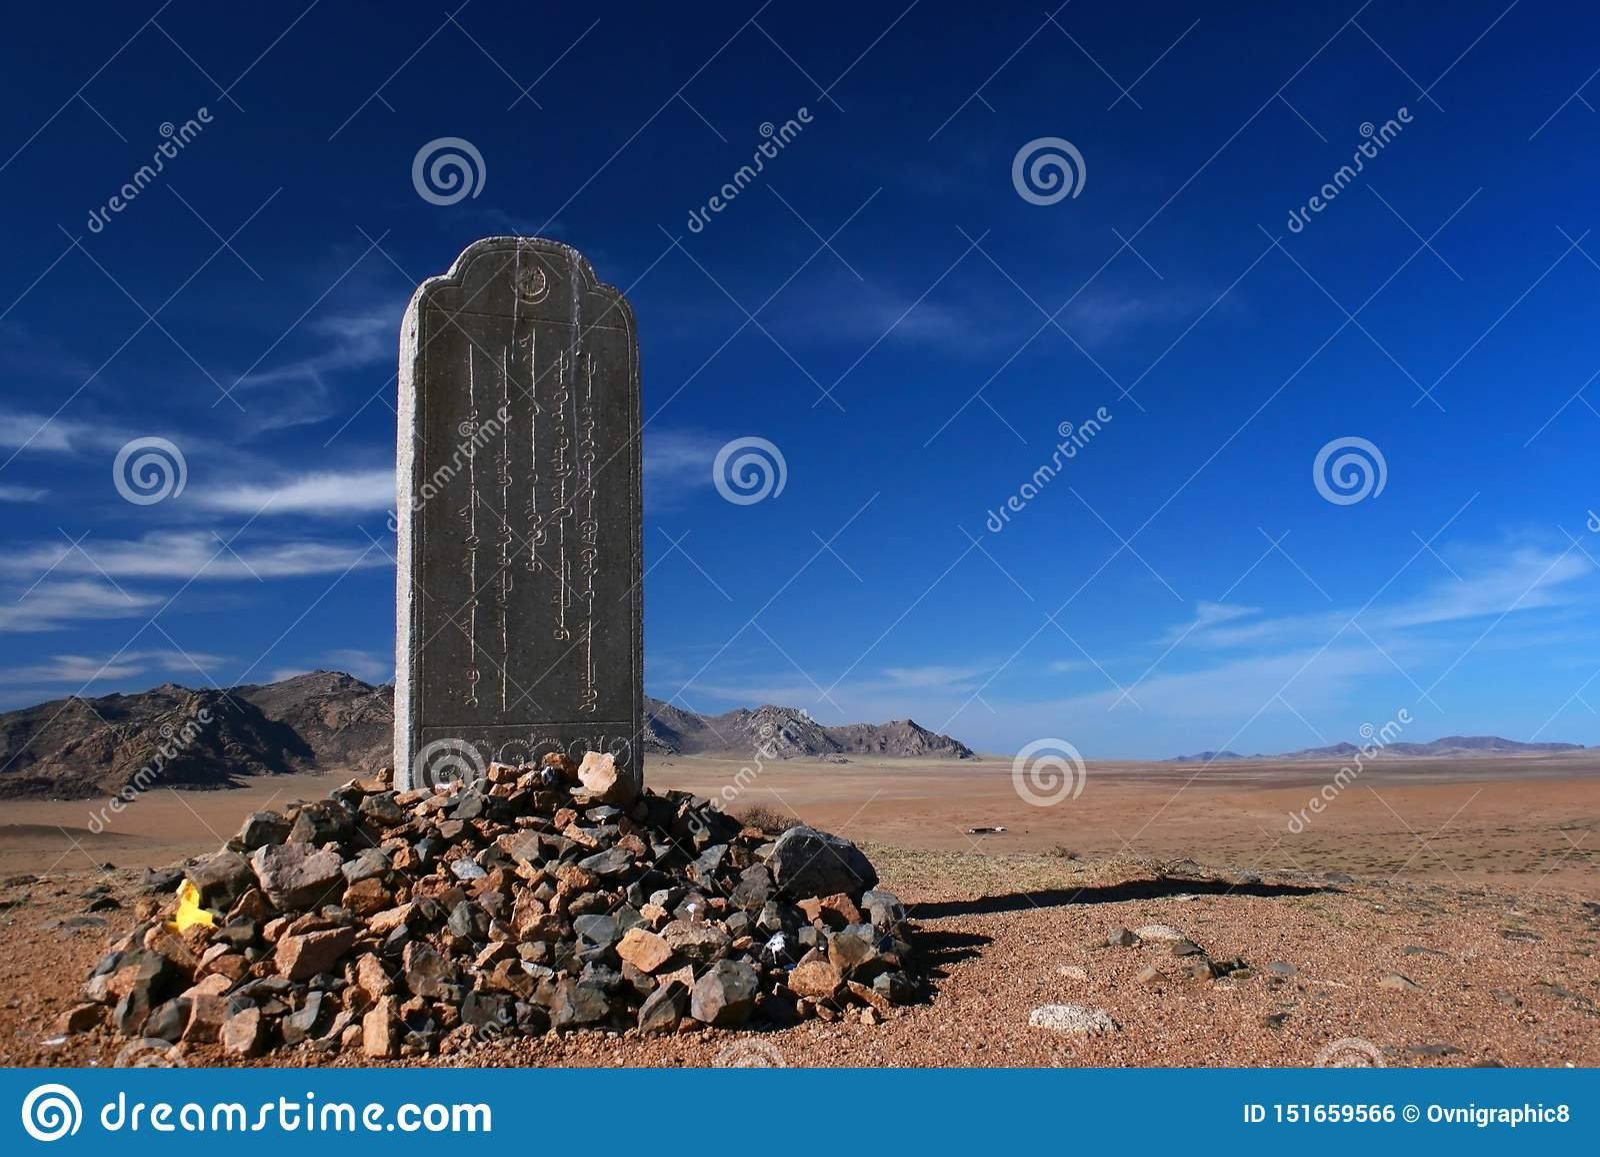 Stele gewijd aan Mandukhai of Mandukhai Khatun Koningin Mandukhai Wijs in de steppe van Mongolië op een zonnige dag